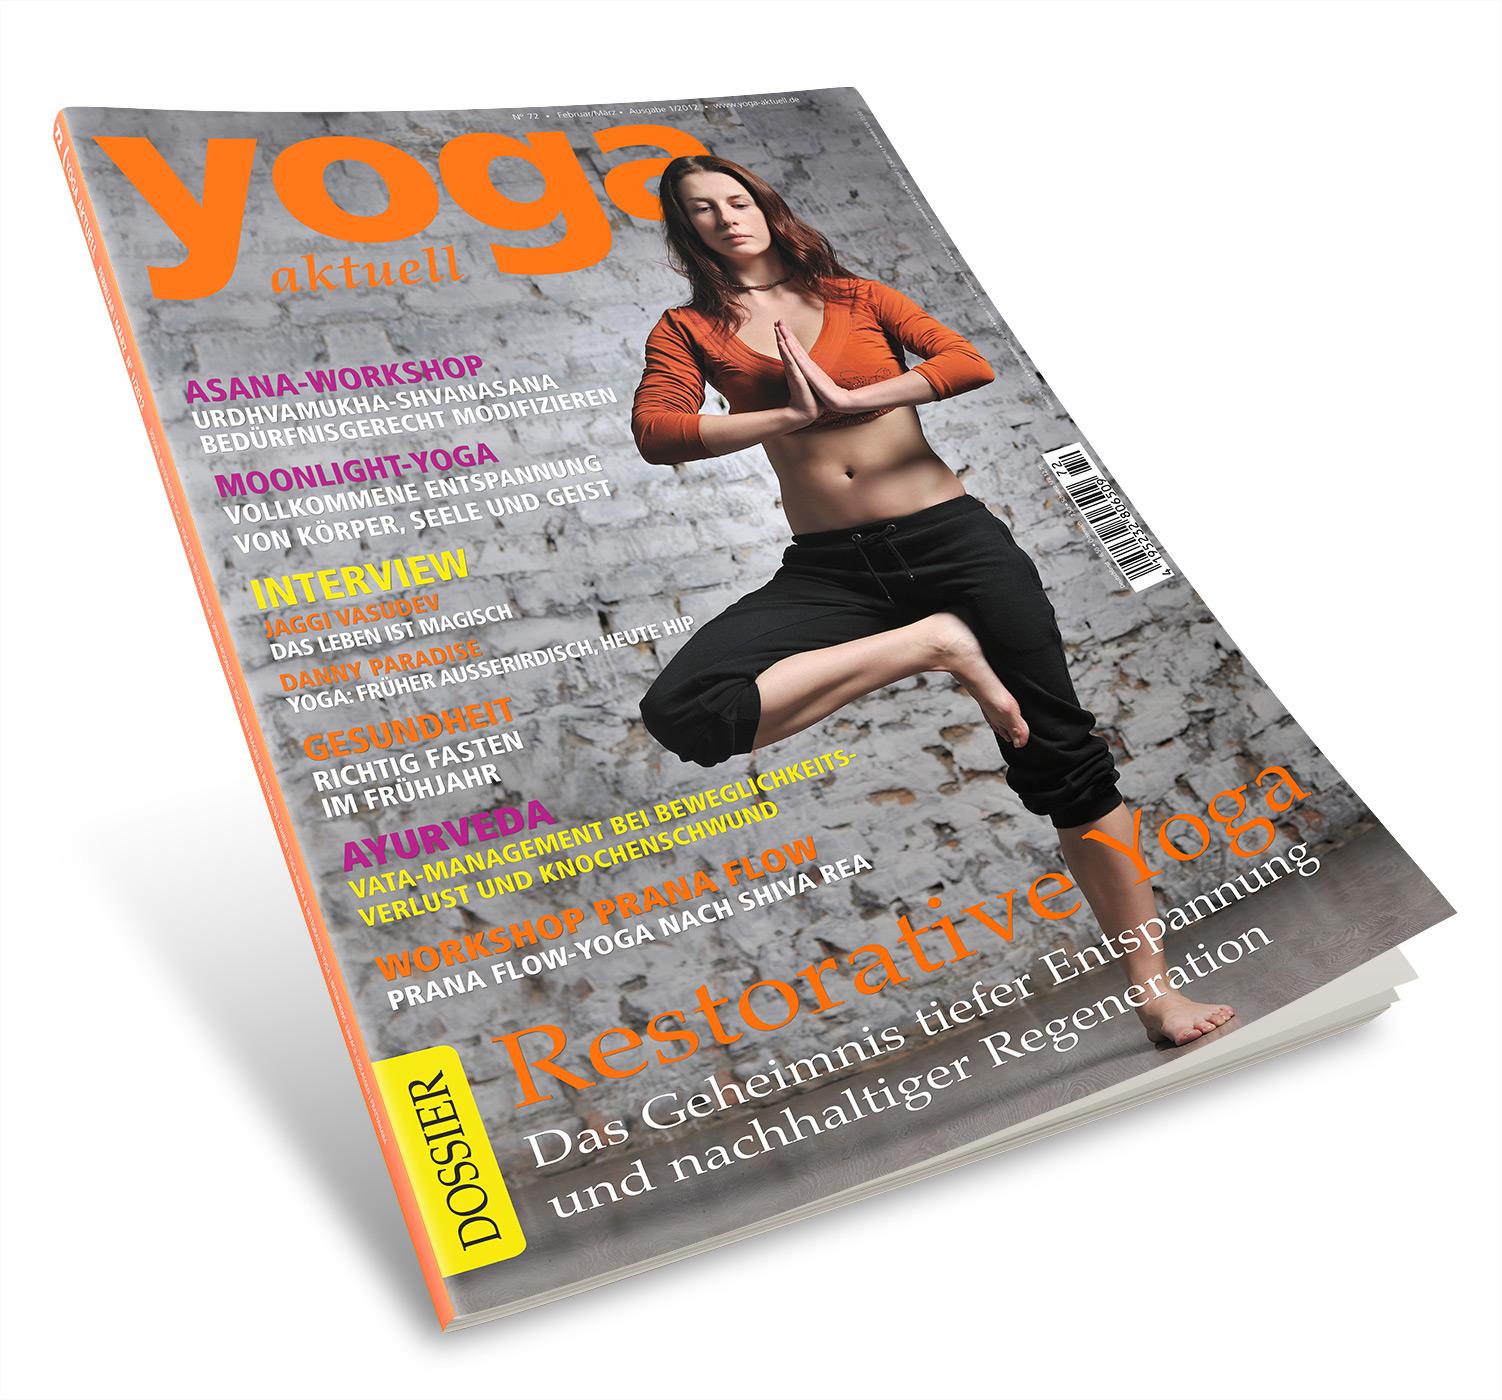 Yoga Aktuell 72 - 01/2012